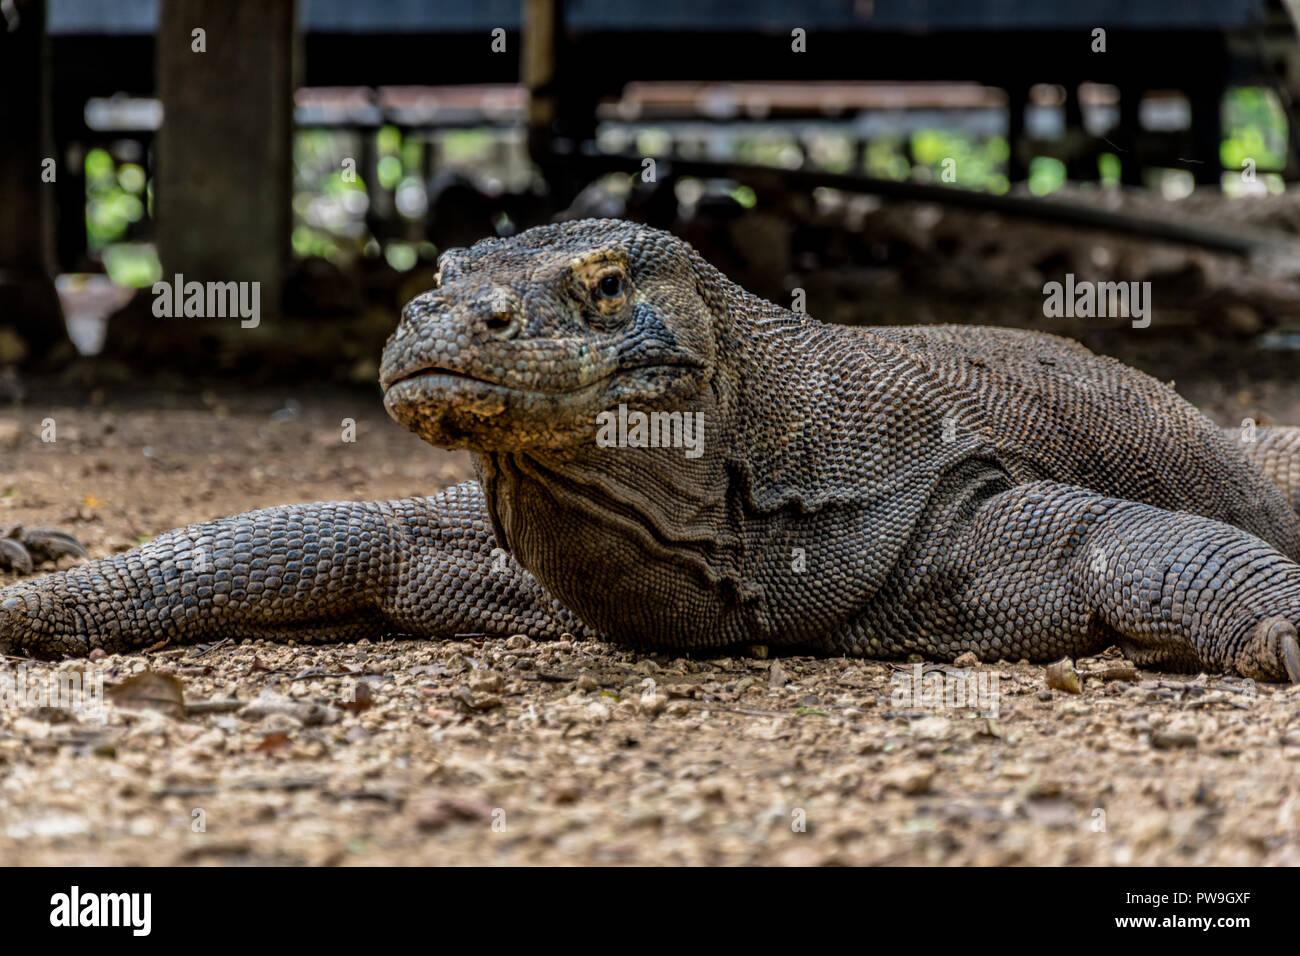 Komodo Dragon, Biggest Lizard - Komodo National Park, Indonesia, Asia - Stock Image